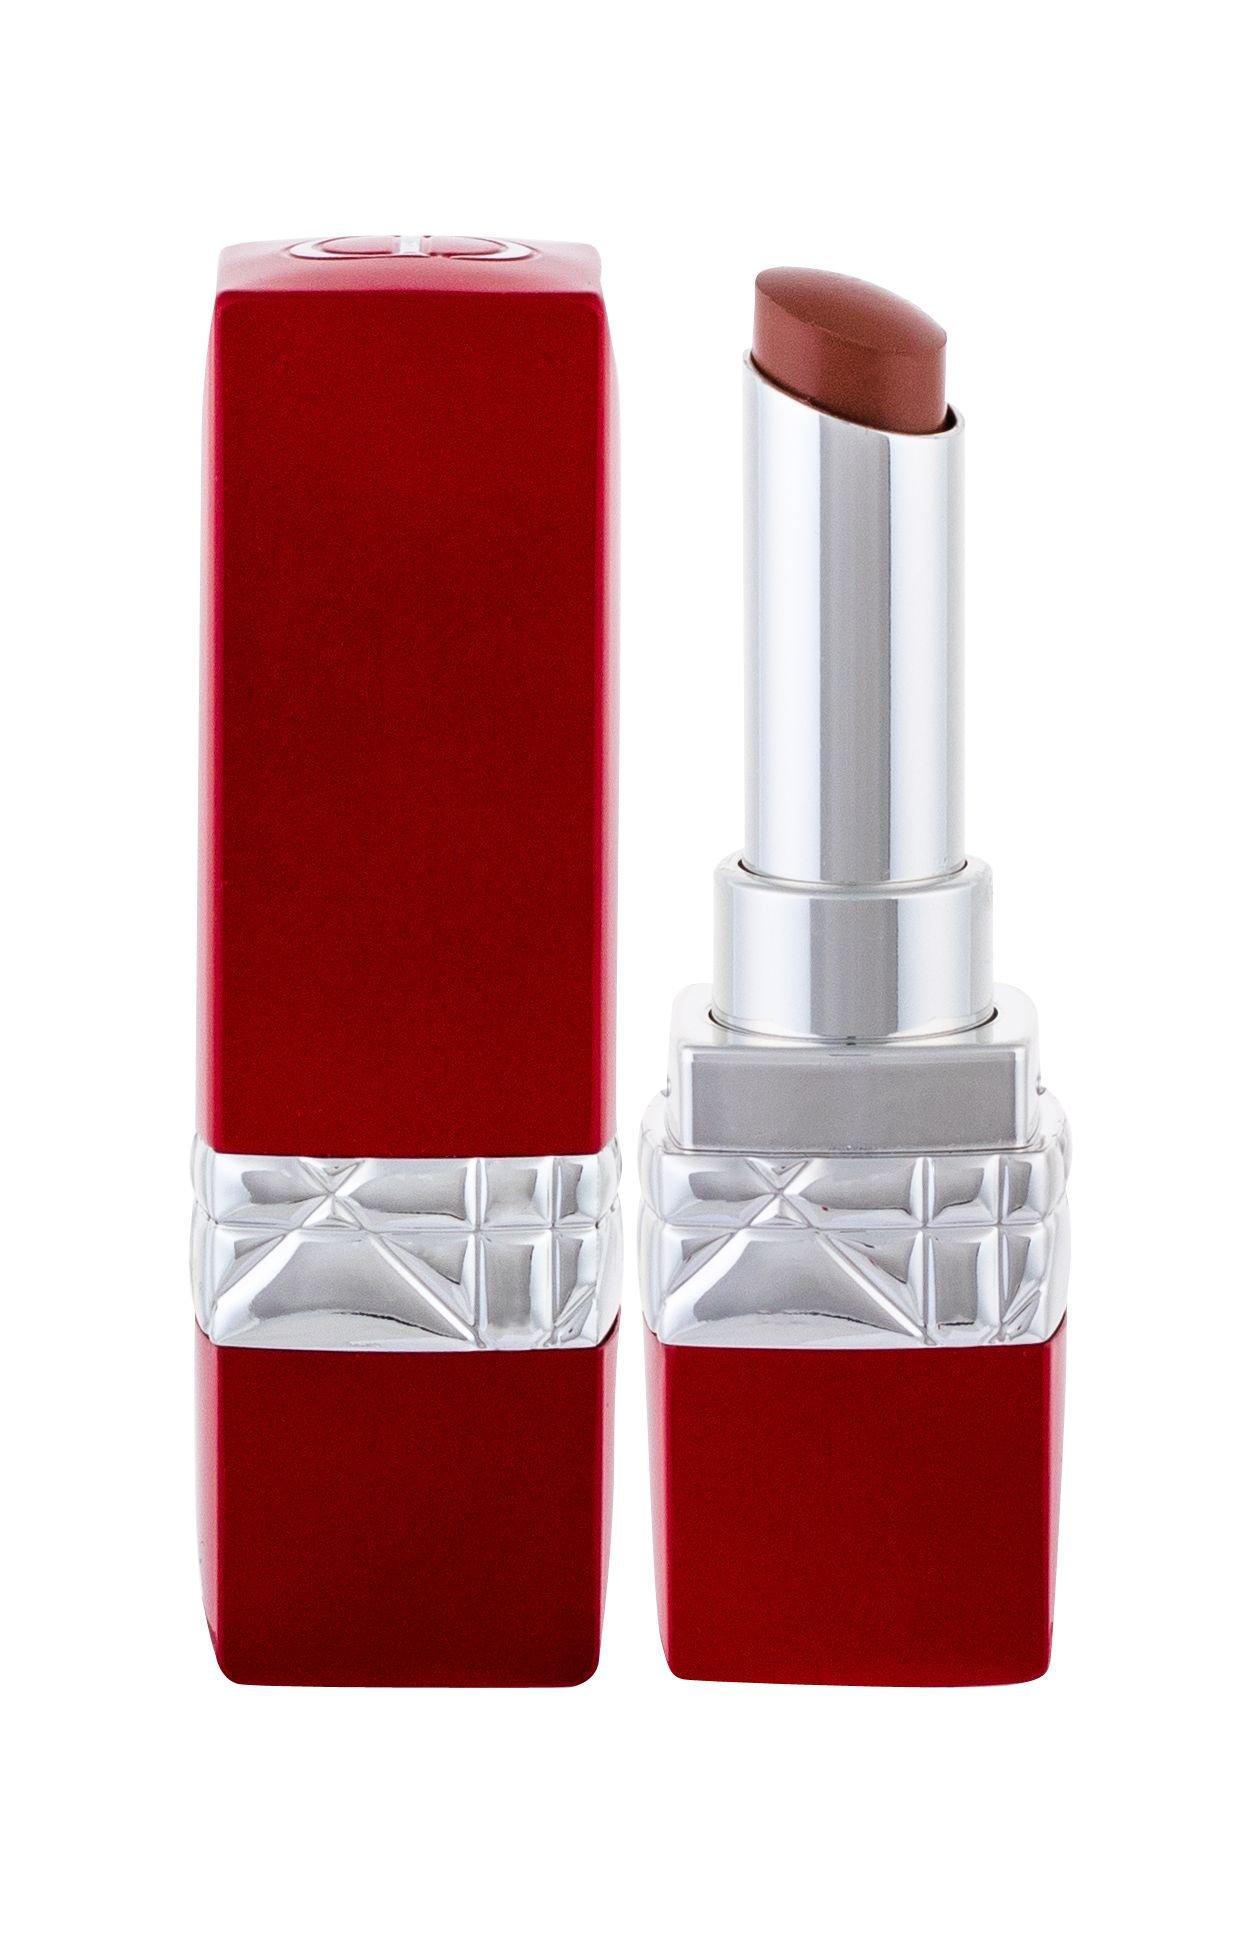 Christian Dior Rouge Dior Lipstick 3,2ml 325 Ultra Tender